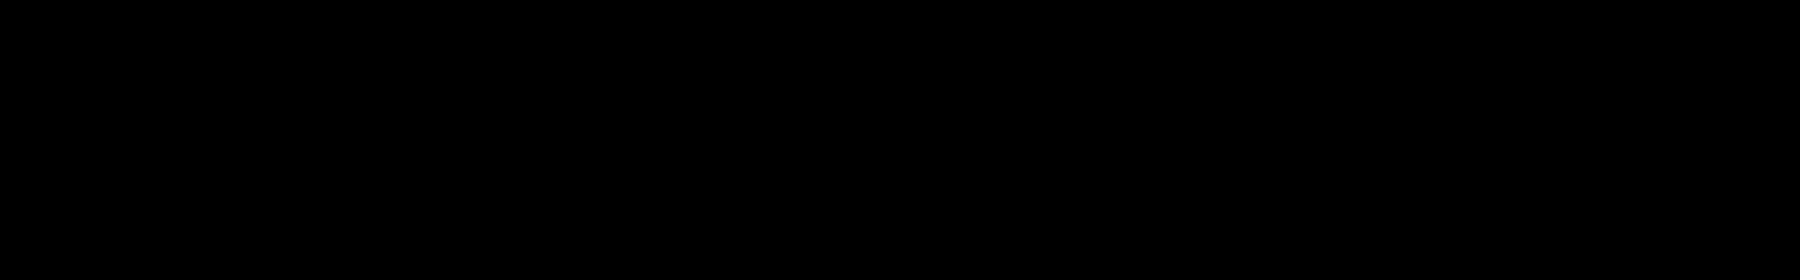 Percussion - Kontakt audio waveform